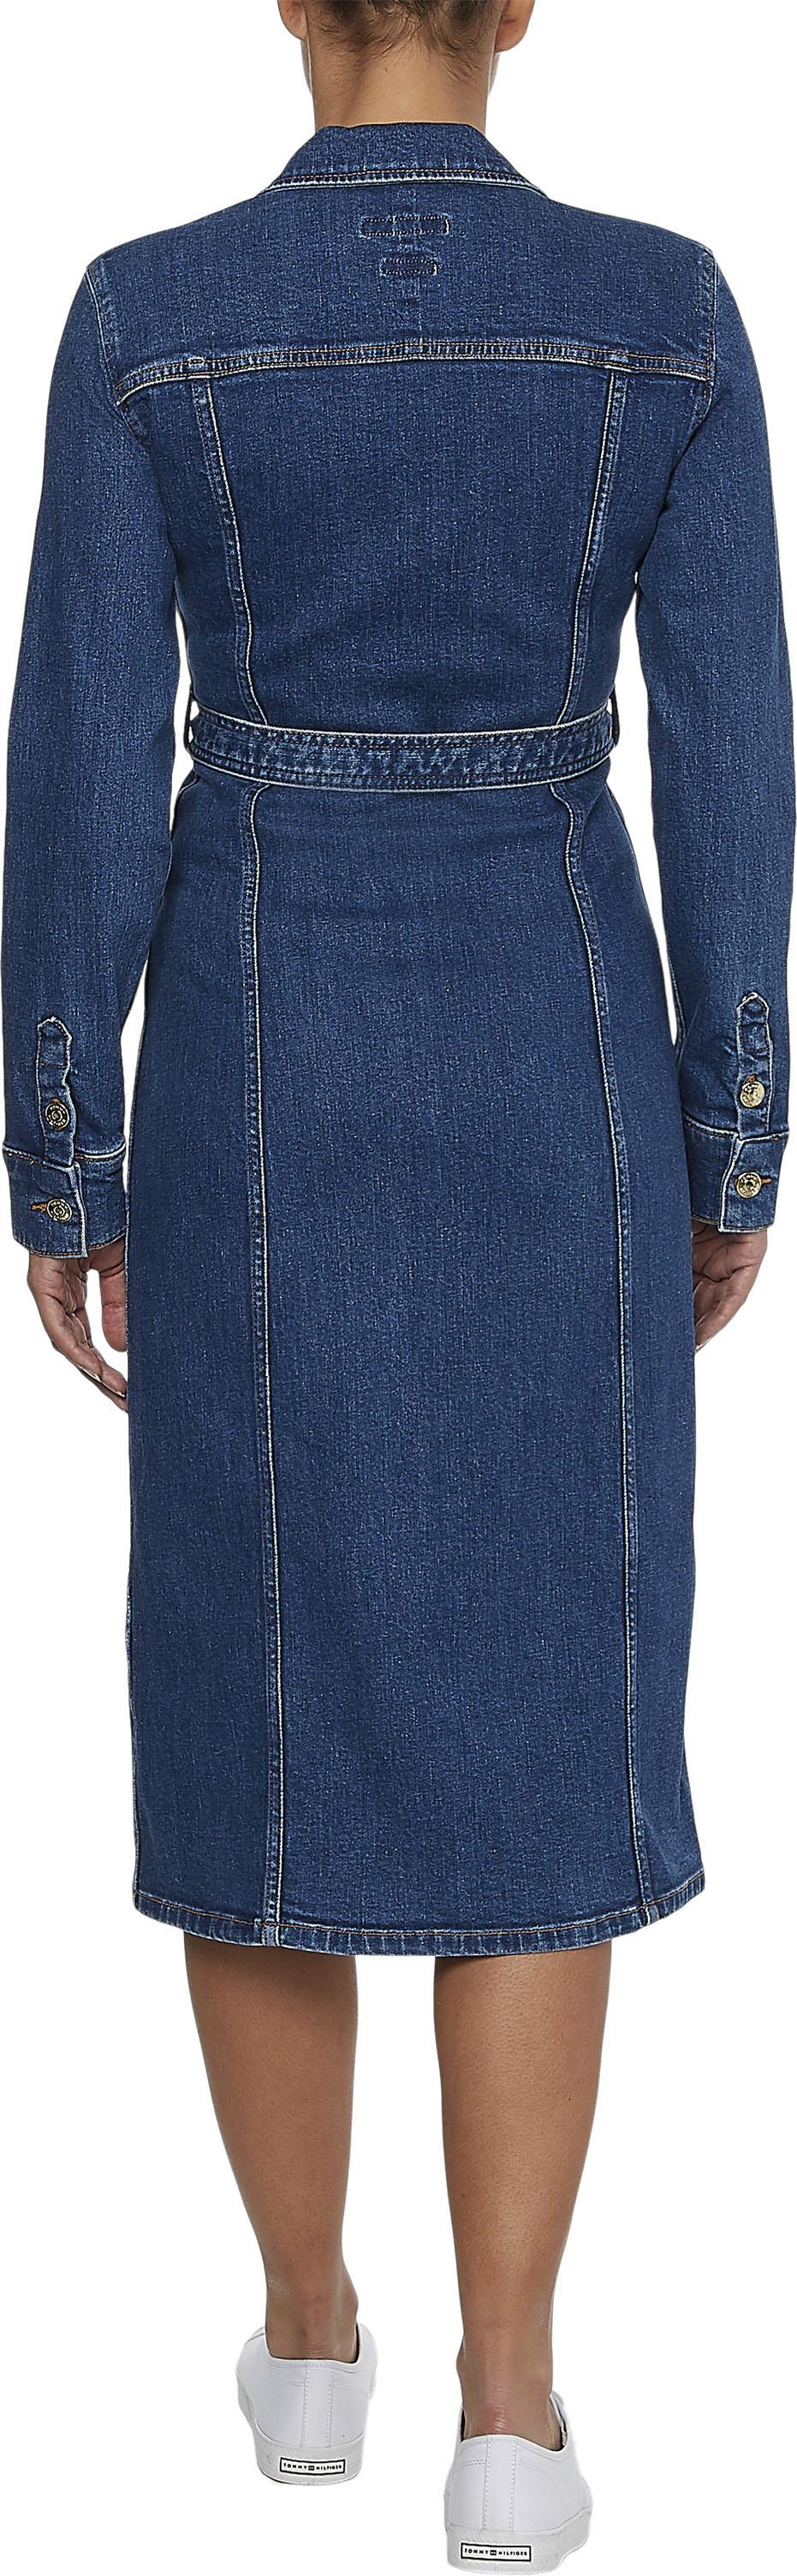 tommy hilfiger -  Jeanskleid FITTED MIDI LENGTH LENY DRESS LS, mit passendem Jeansgürtel